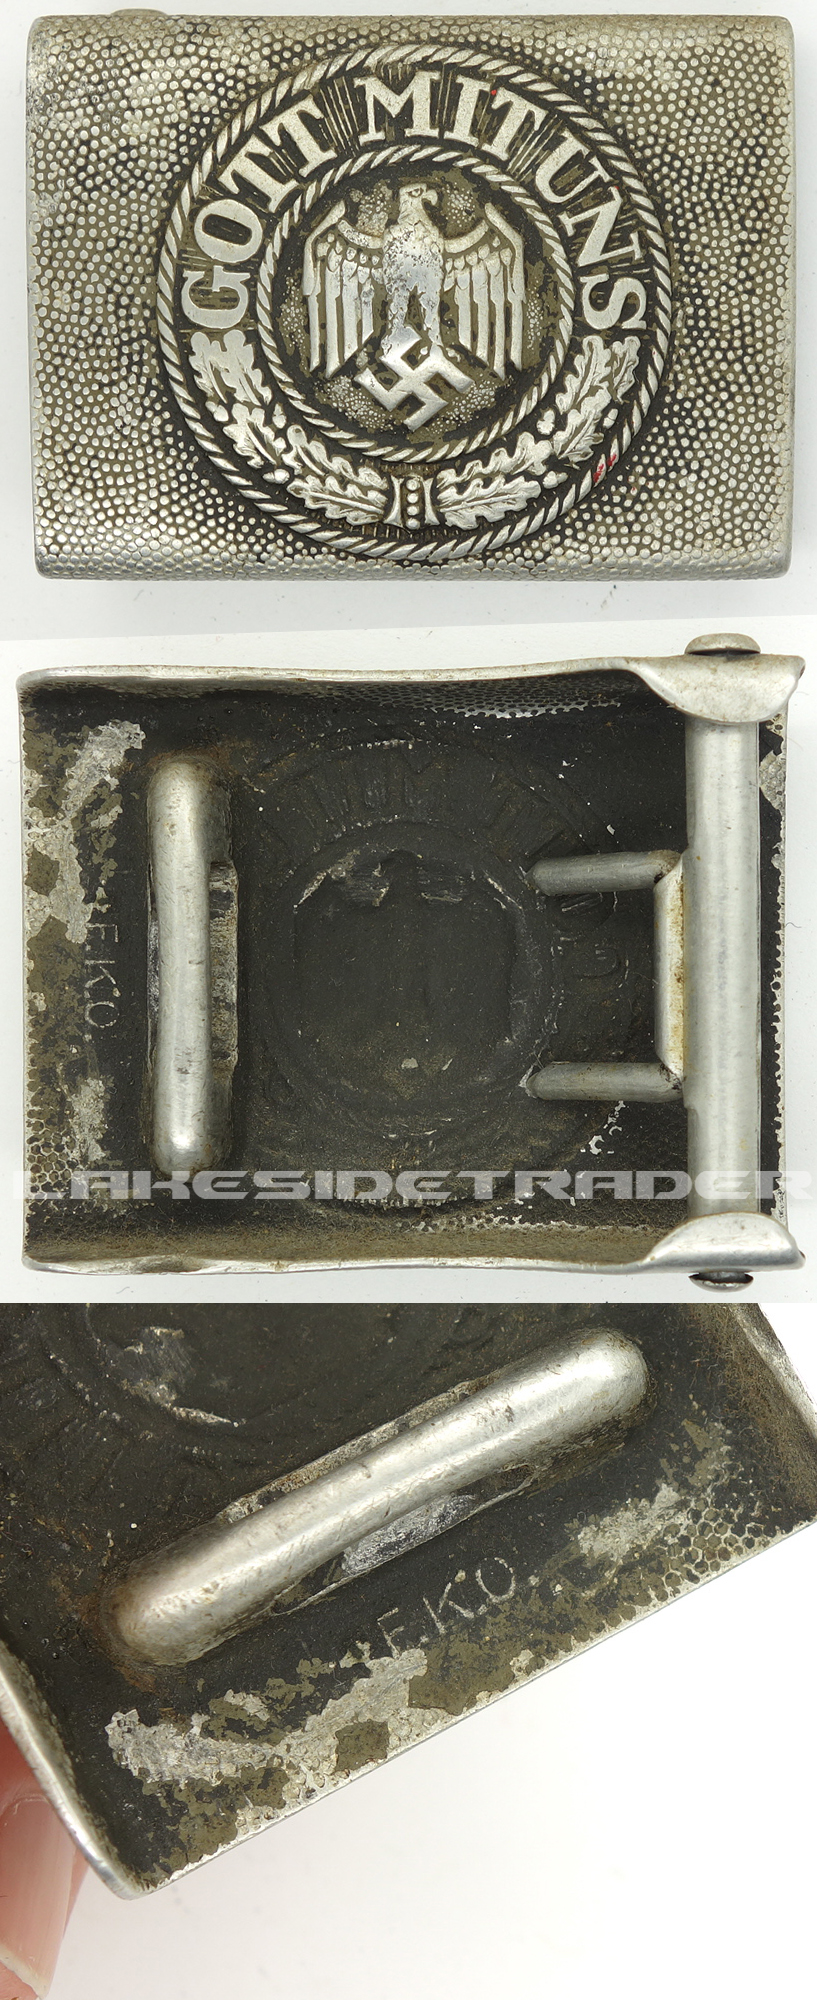 Early Aluminium Army Belt Buckle by F.K.O.